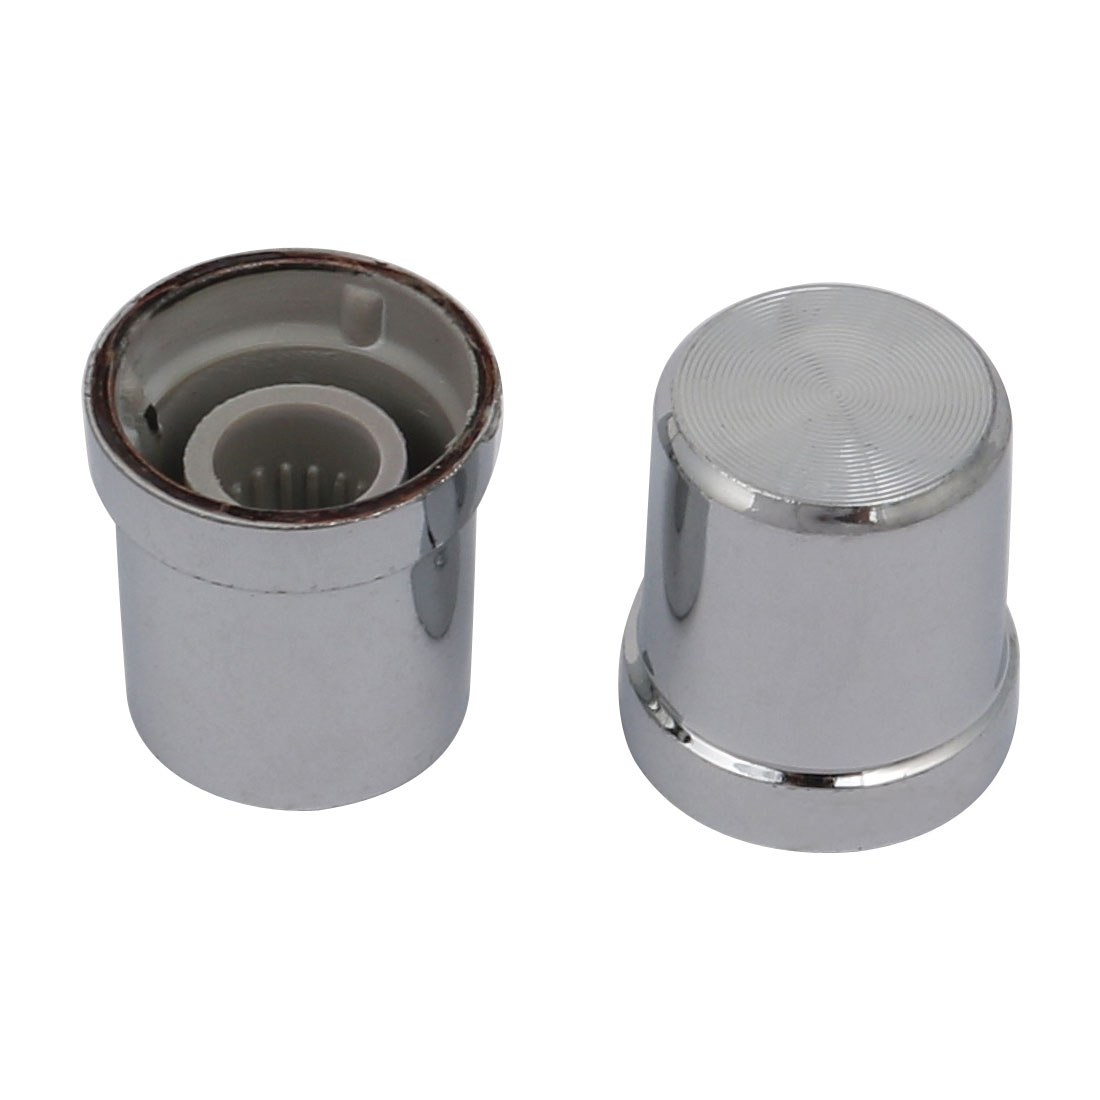 30pcs 14.6mmx16.7mm Plastic Potentiometer Volume Control Rotary Knob Sliver Tone - image 2 of 3